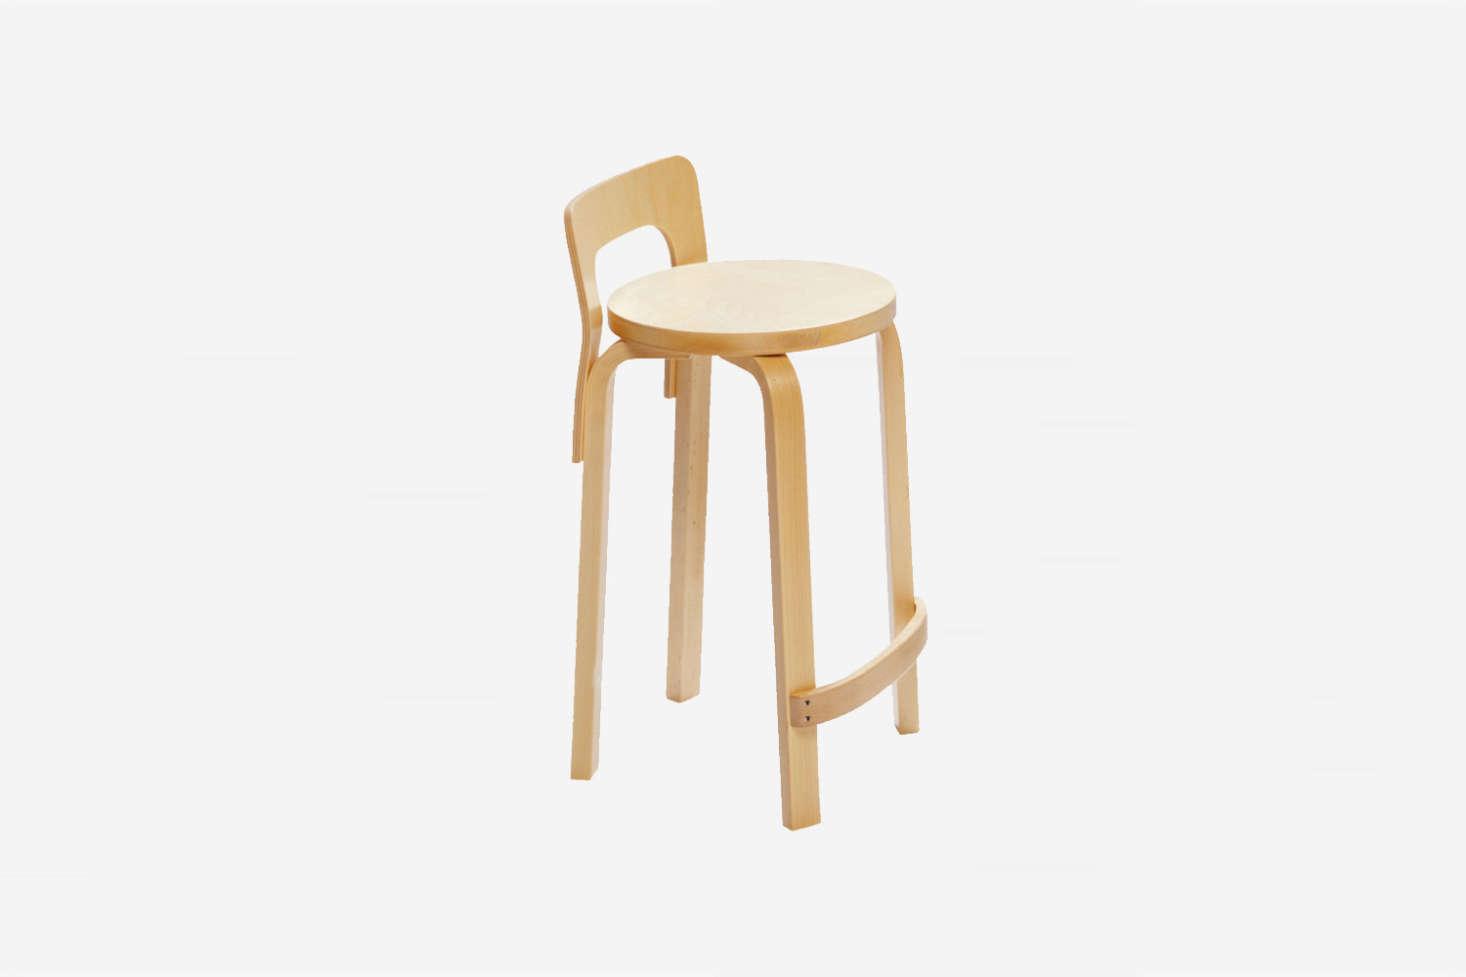 The Artek Aalto High Chair K65 in Birch is $44src=